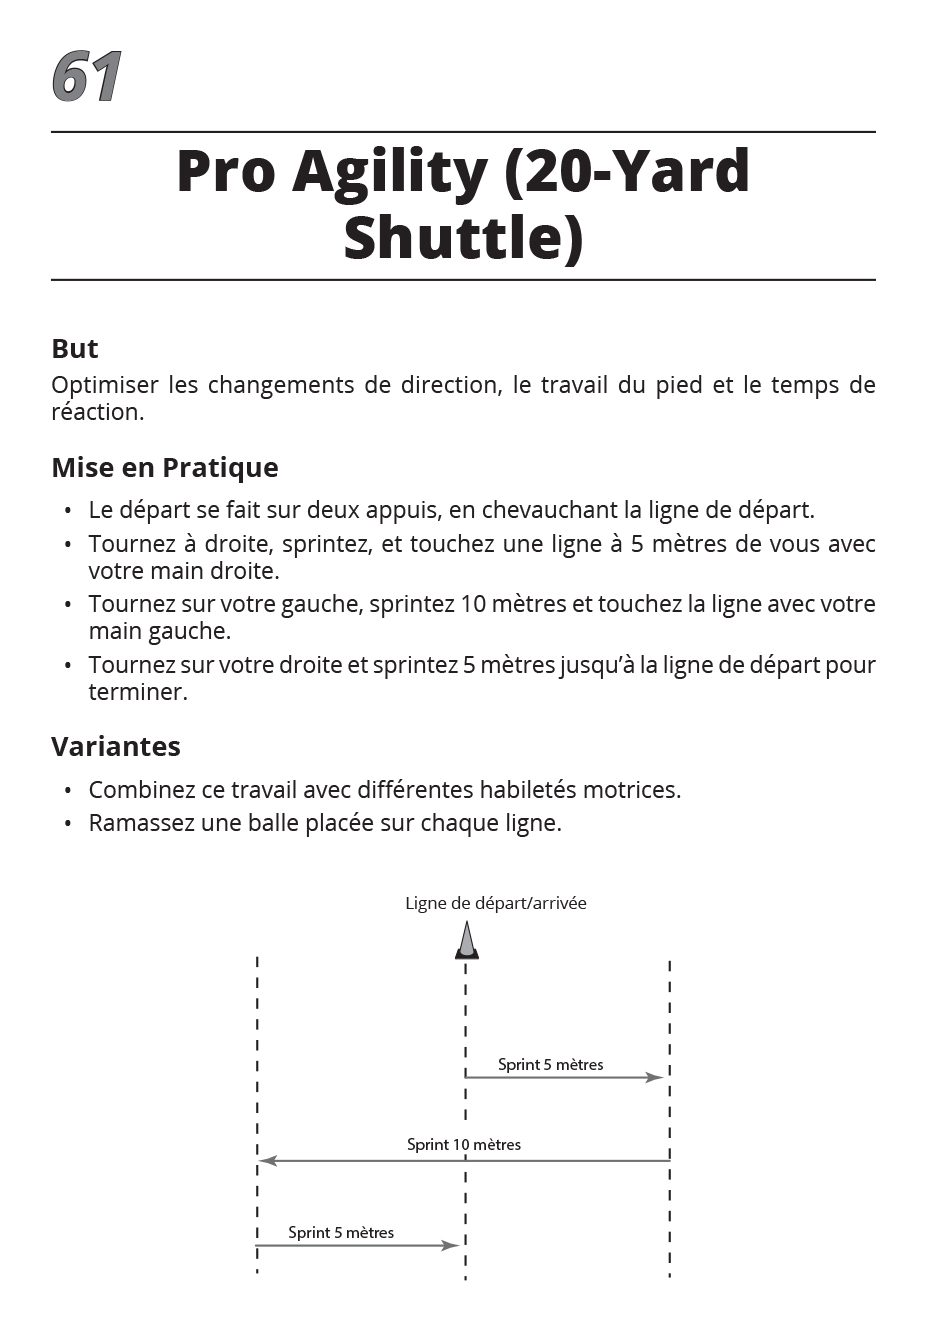 Pro Agility (20-Yard Shuttle)